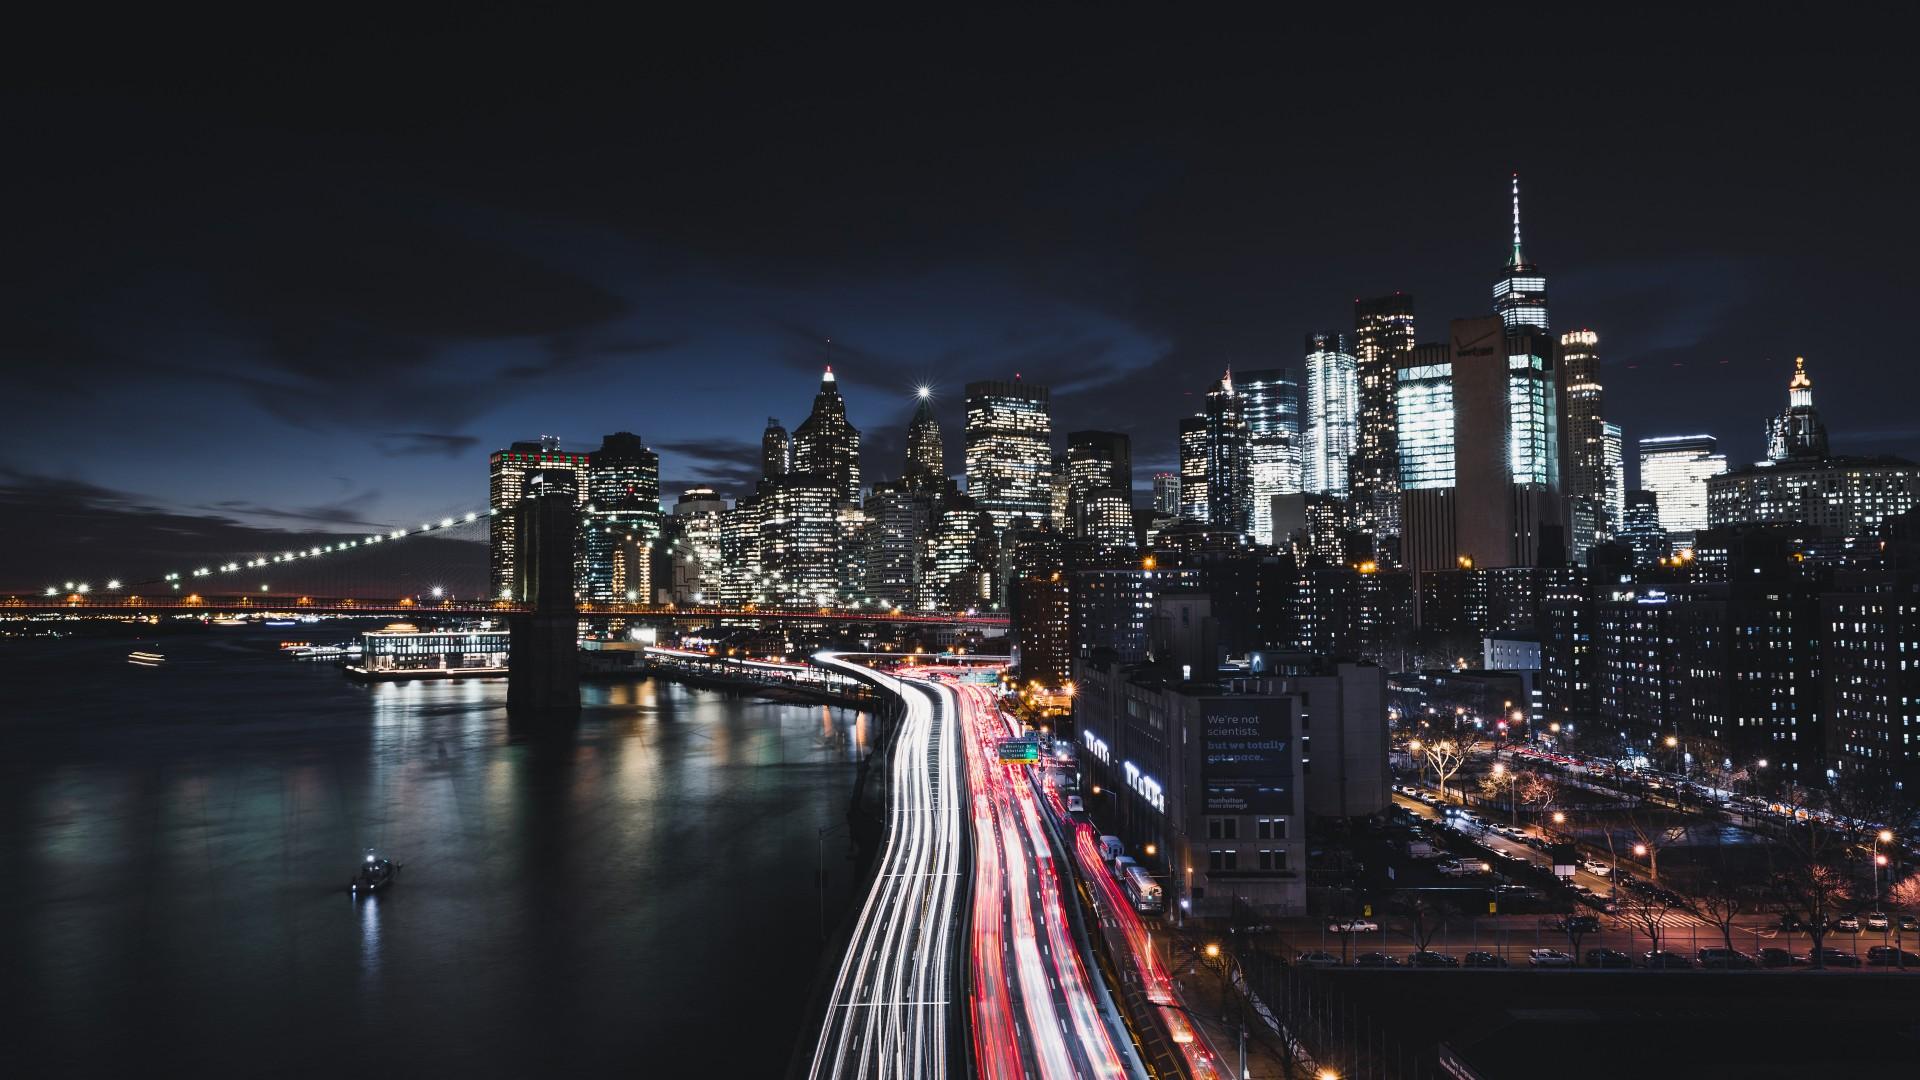 New York City Night Cityscape - New York Night 4k - HD Wallpaper